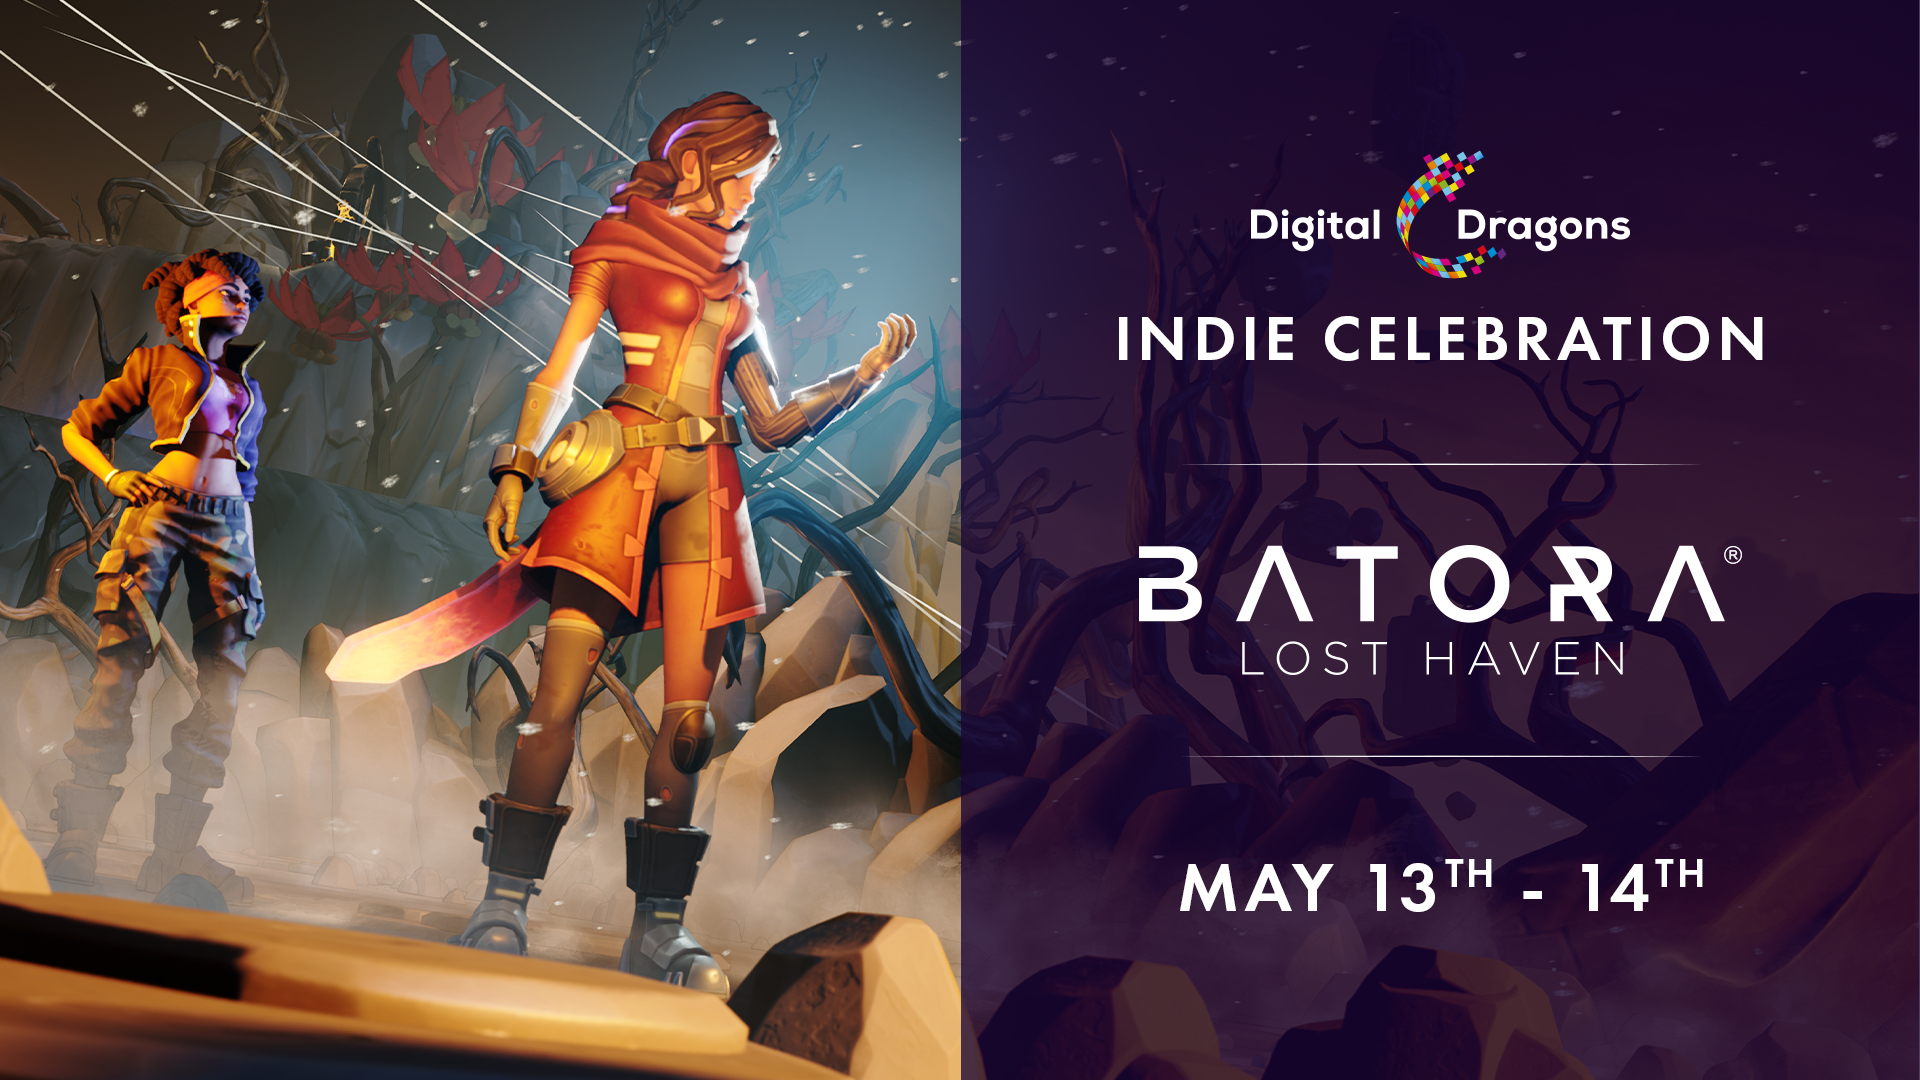 Batora: Lost Haven live at Indie Celebration by Digital Dragons!